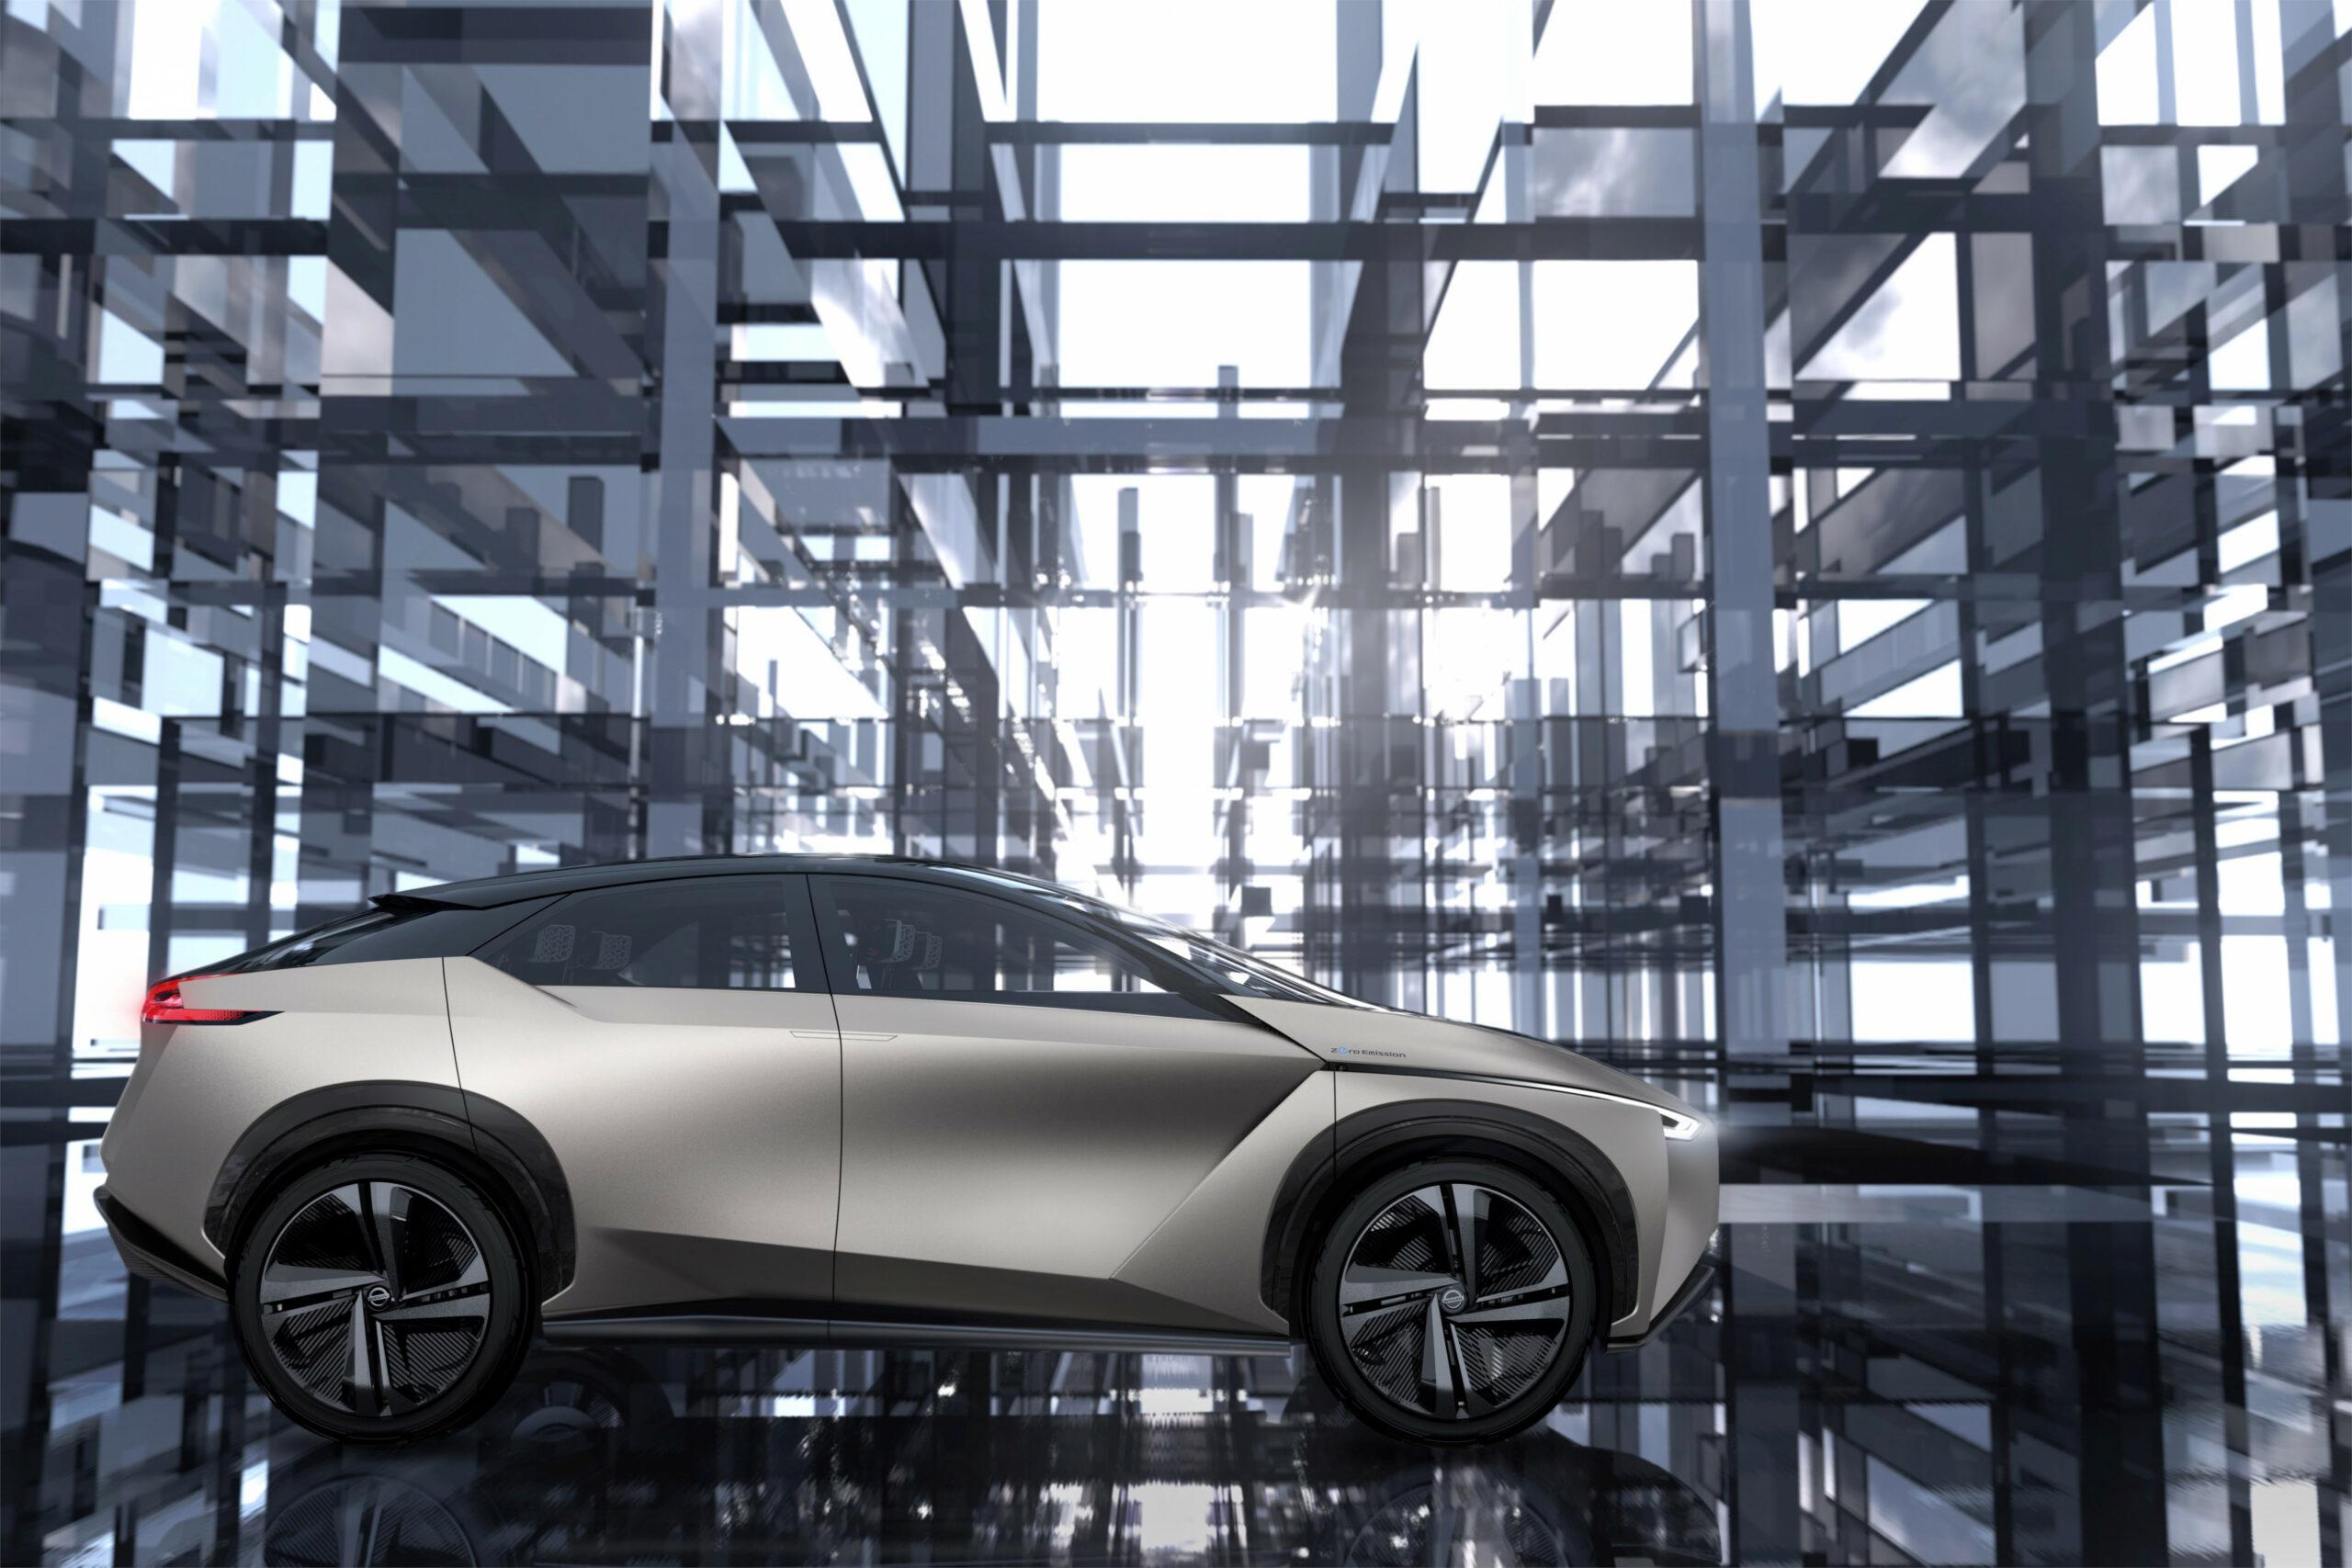 Concept Nissan Serena 2022